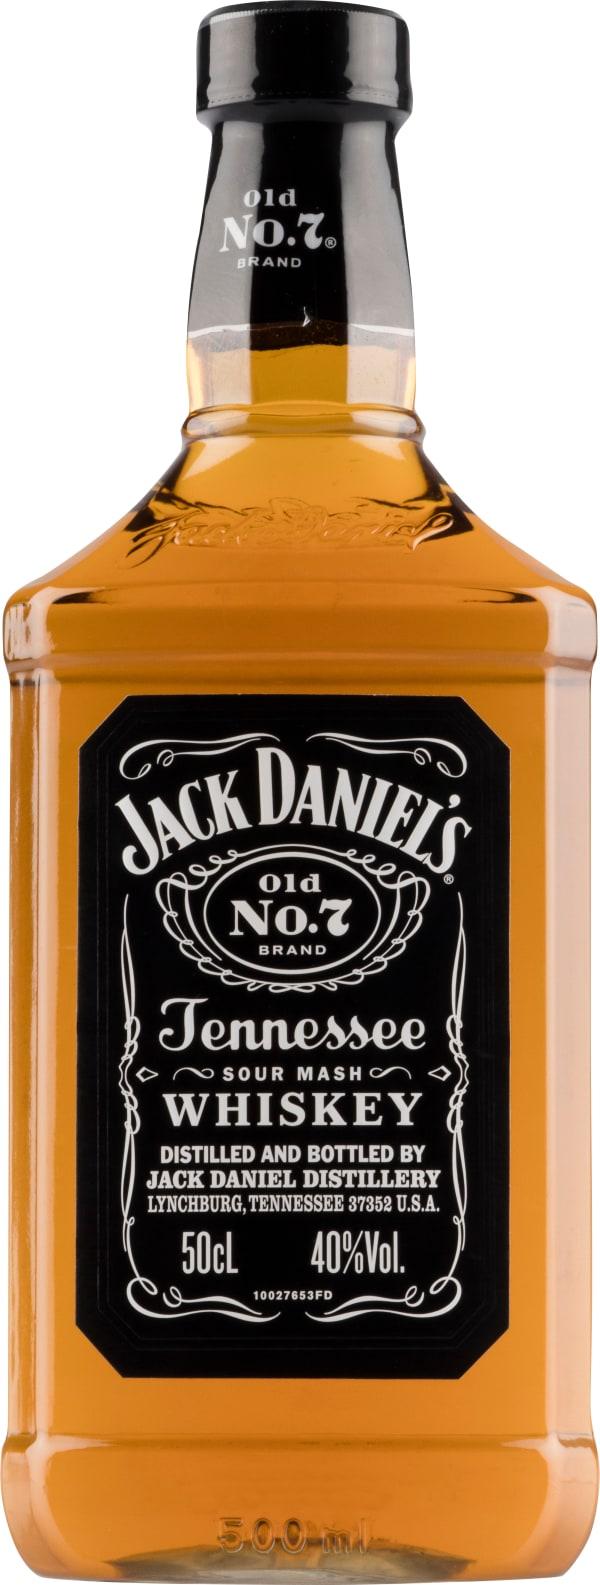 Jack Daniel's Old No. 7 plastic bottle